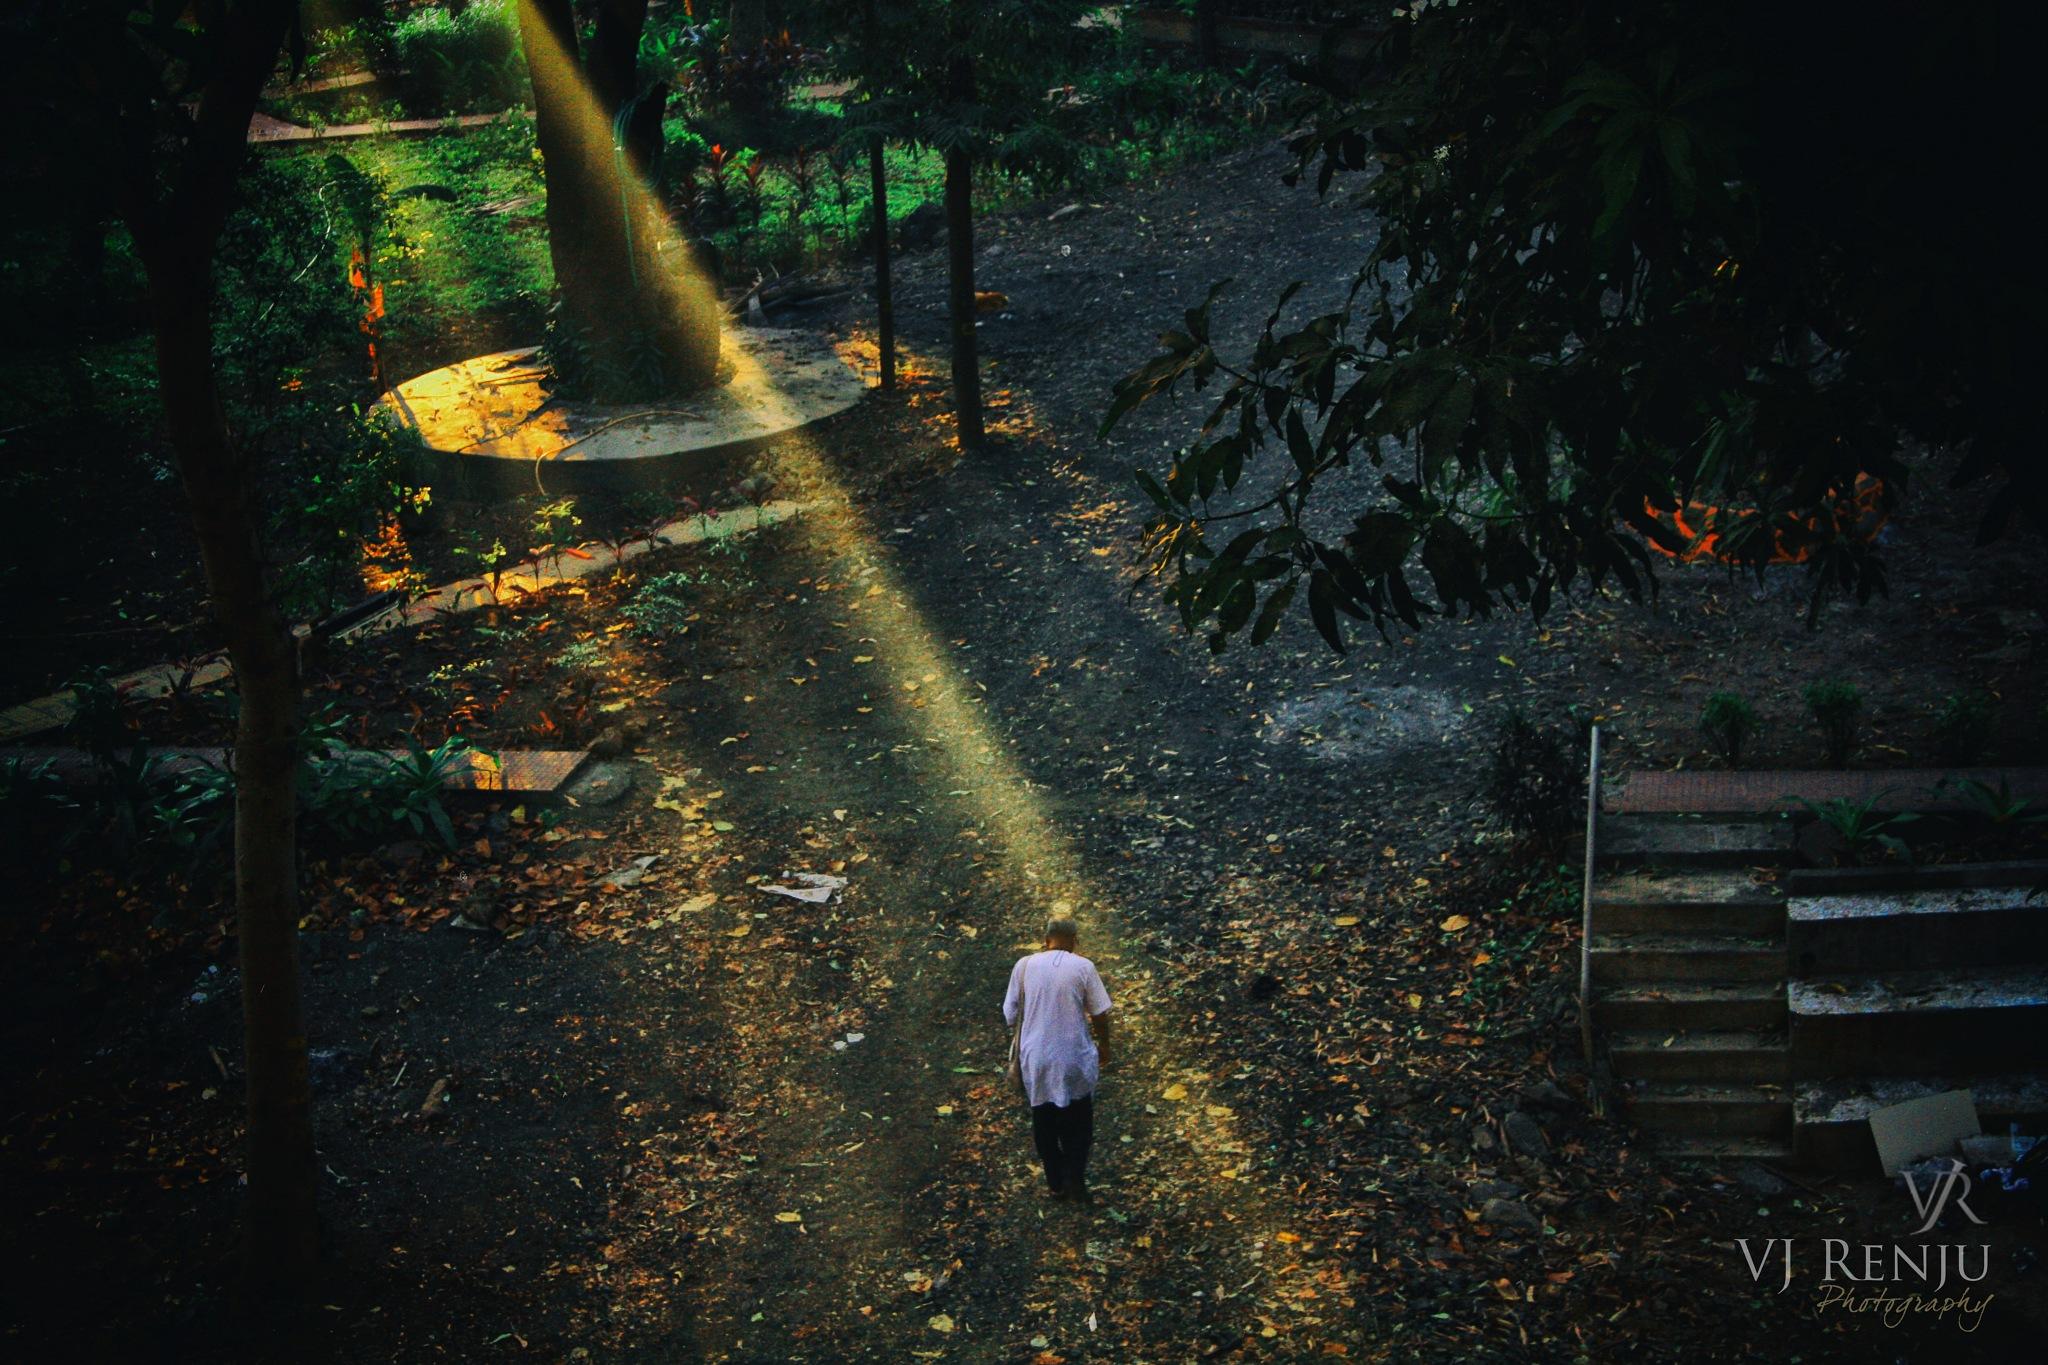 Morning rays by VJ Renju